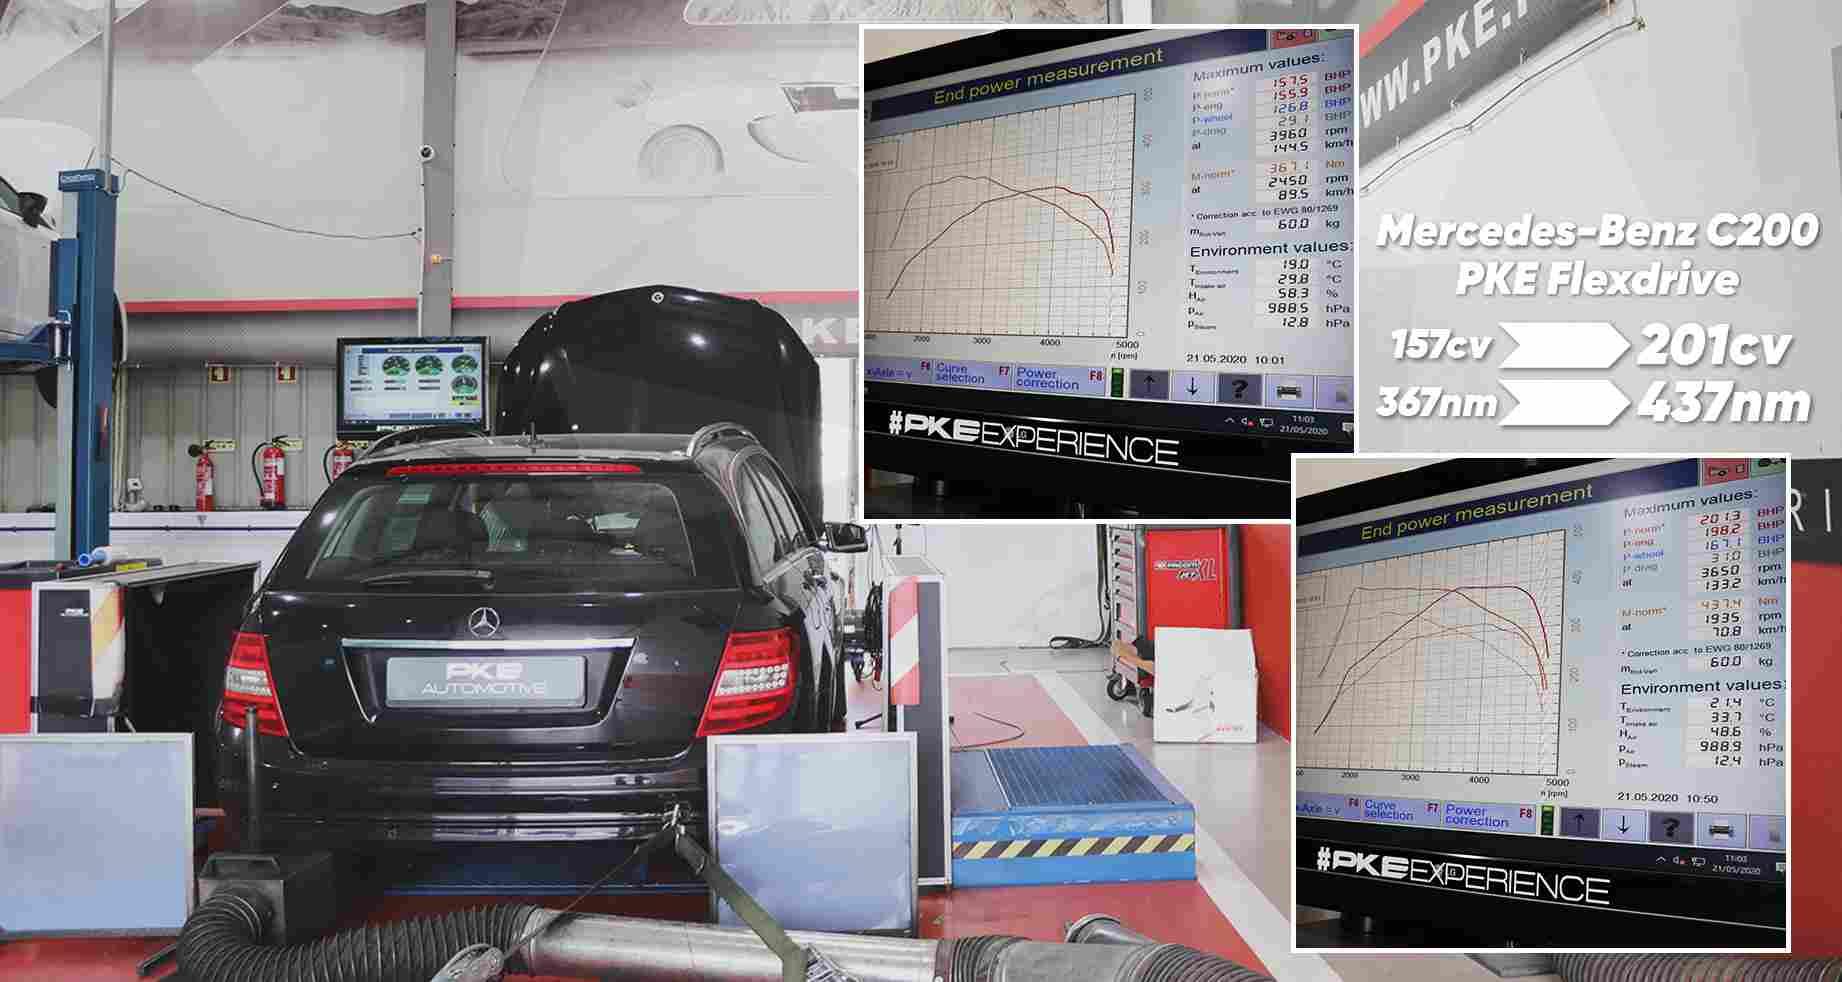 PKE FlexDRIVE - Mercedes-Benz C200 CDI